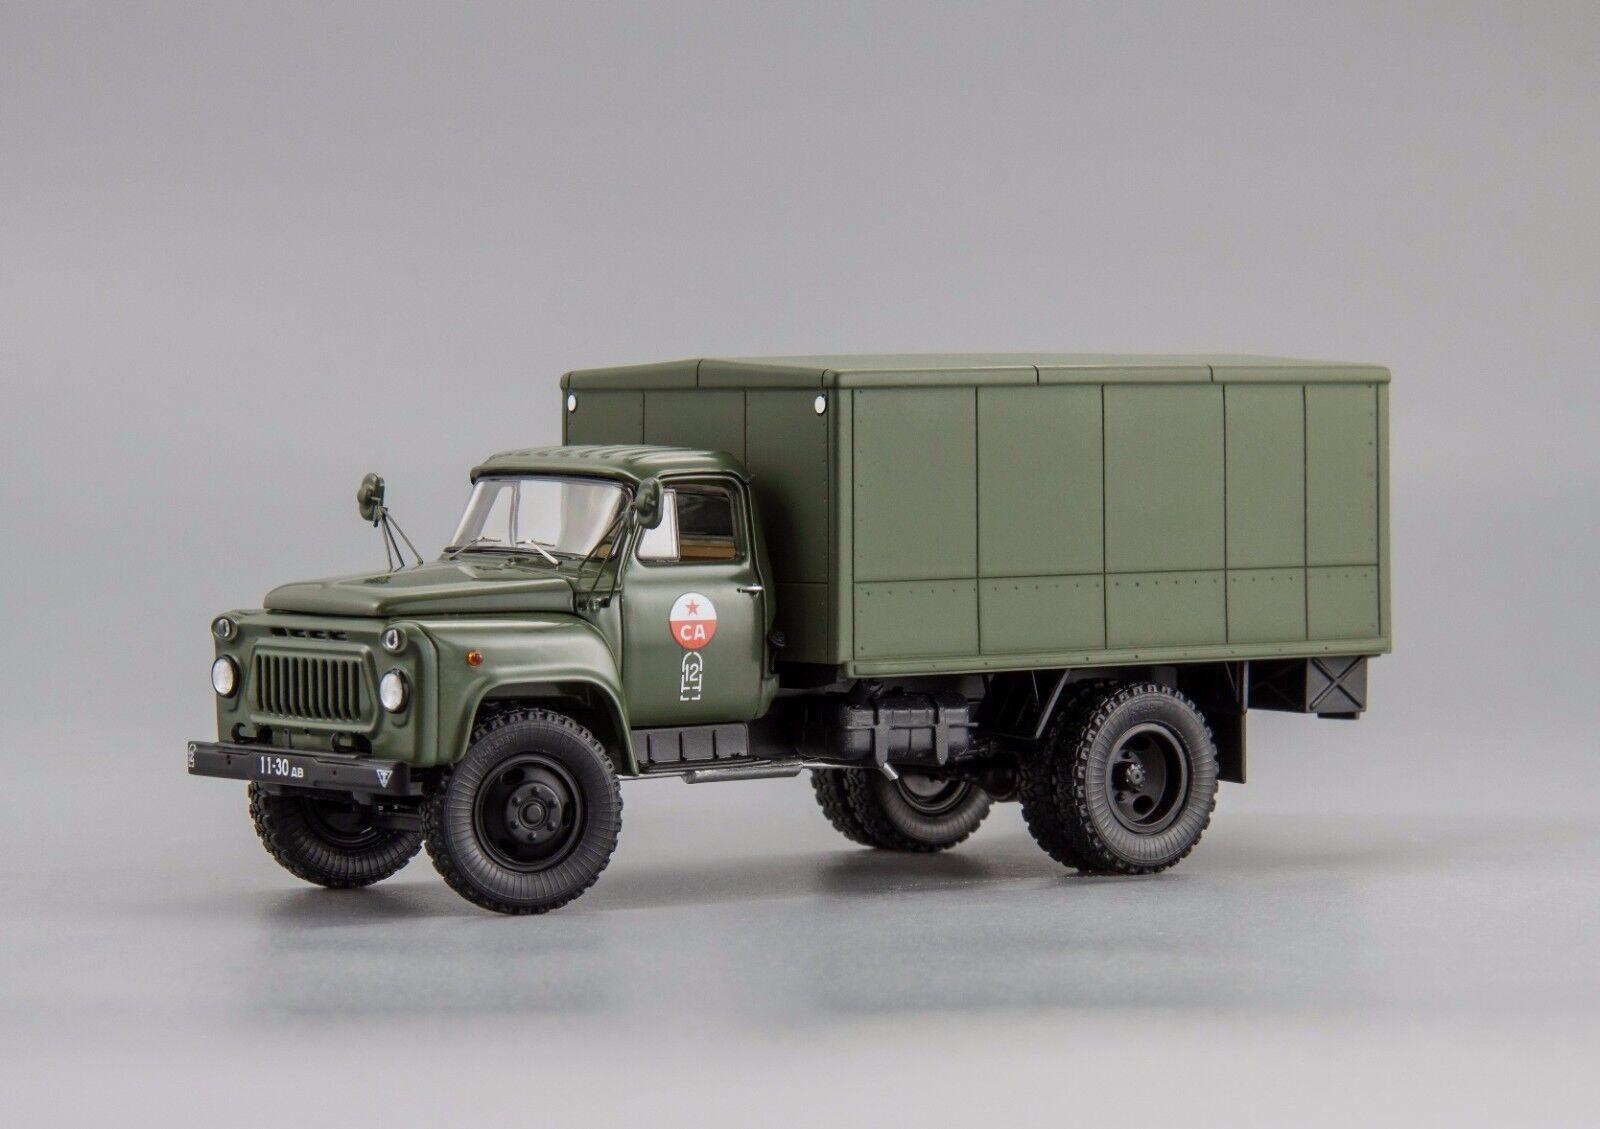 Газ - 53 афк - 53  автофургон  1980 г.  gaz-53 dip - modelle 1   43 l.e. 360 stk.